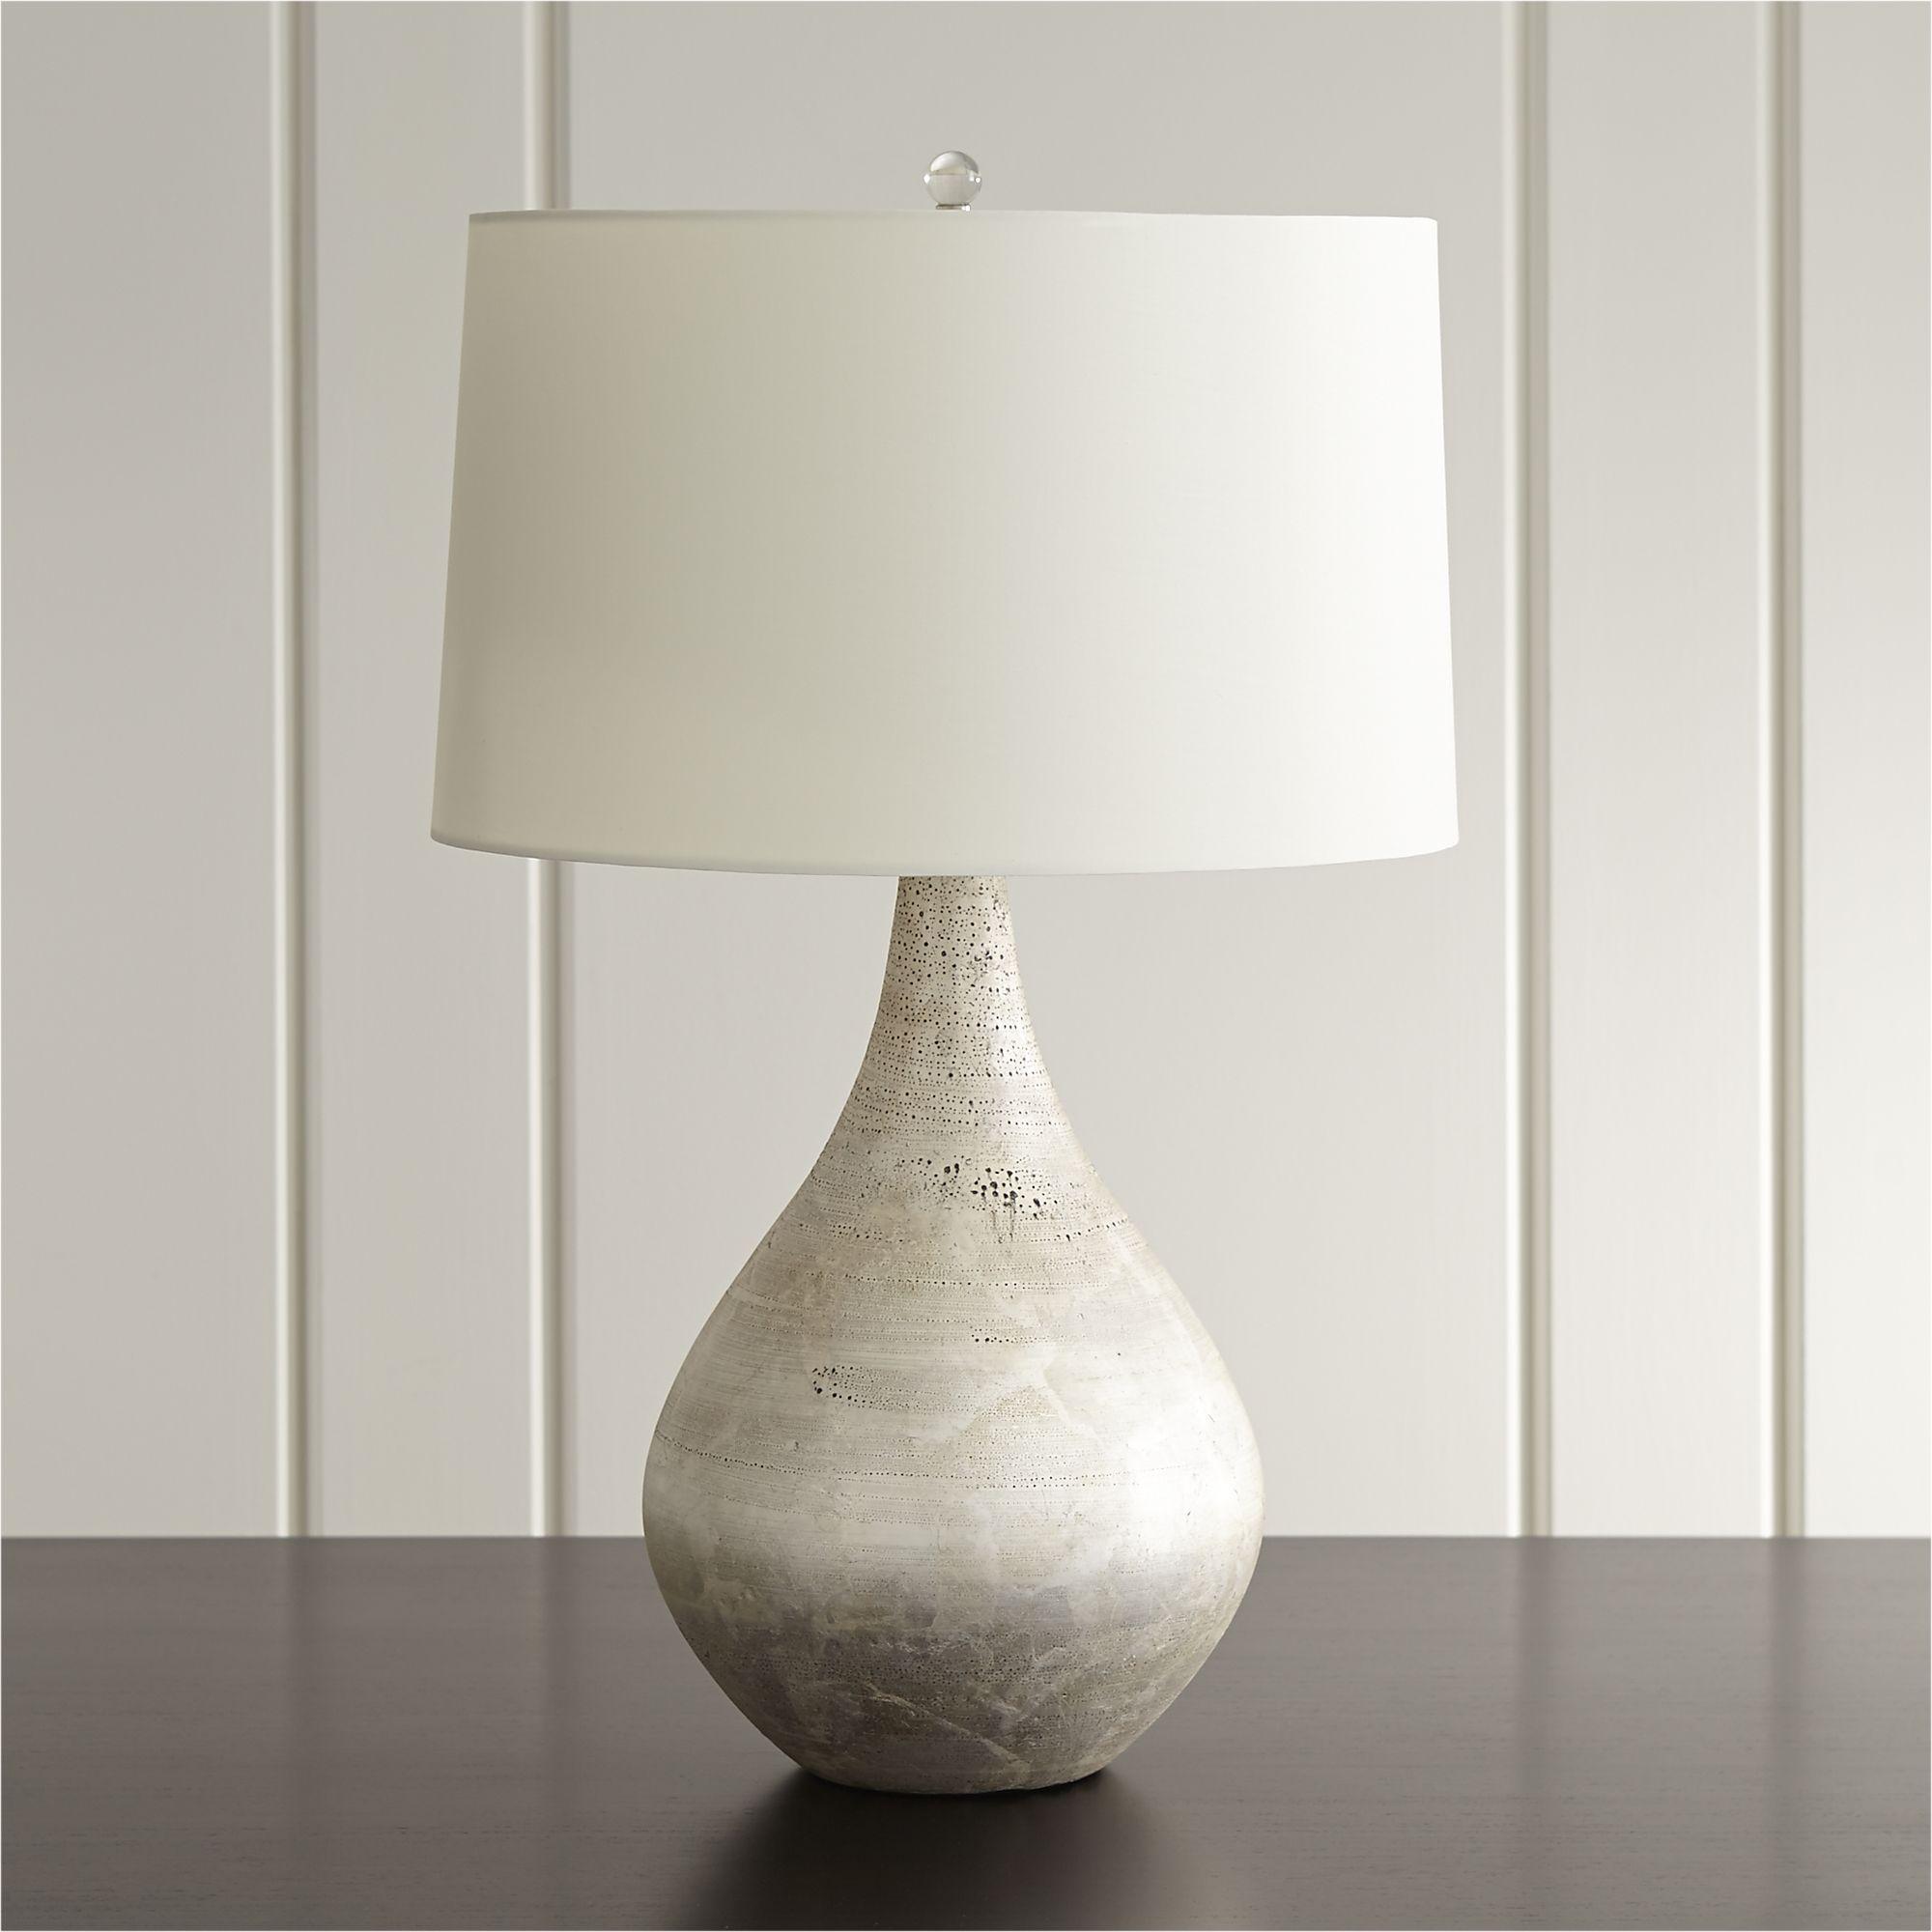 Mulino Teardrop Table Lamp + Reviews Crate and Barrel